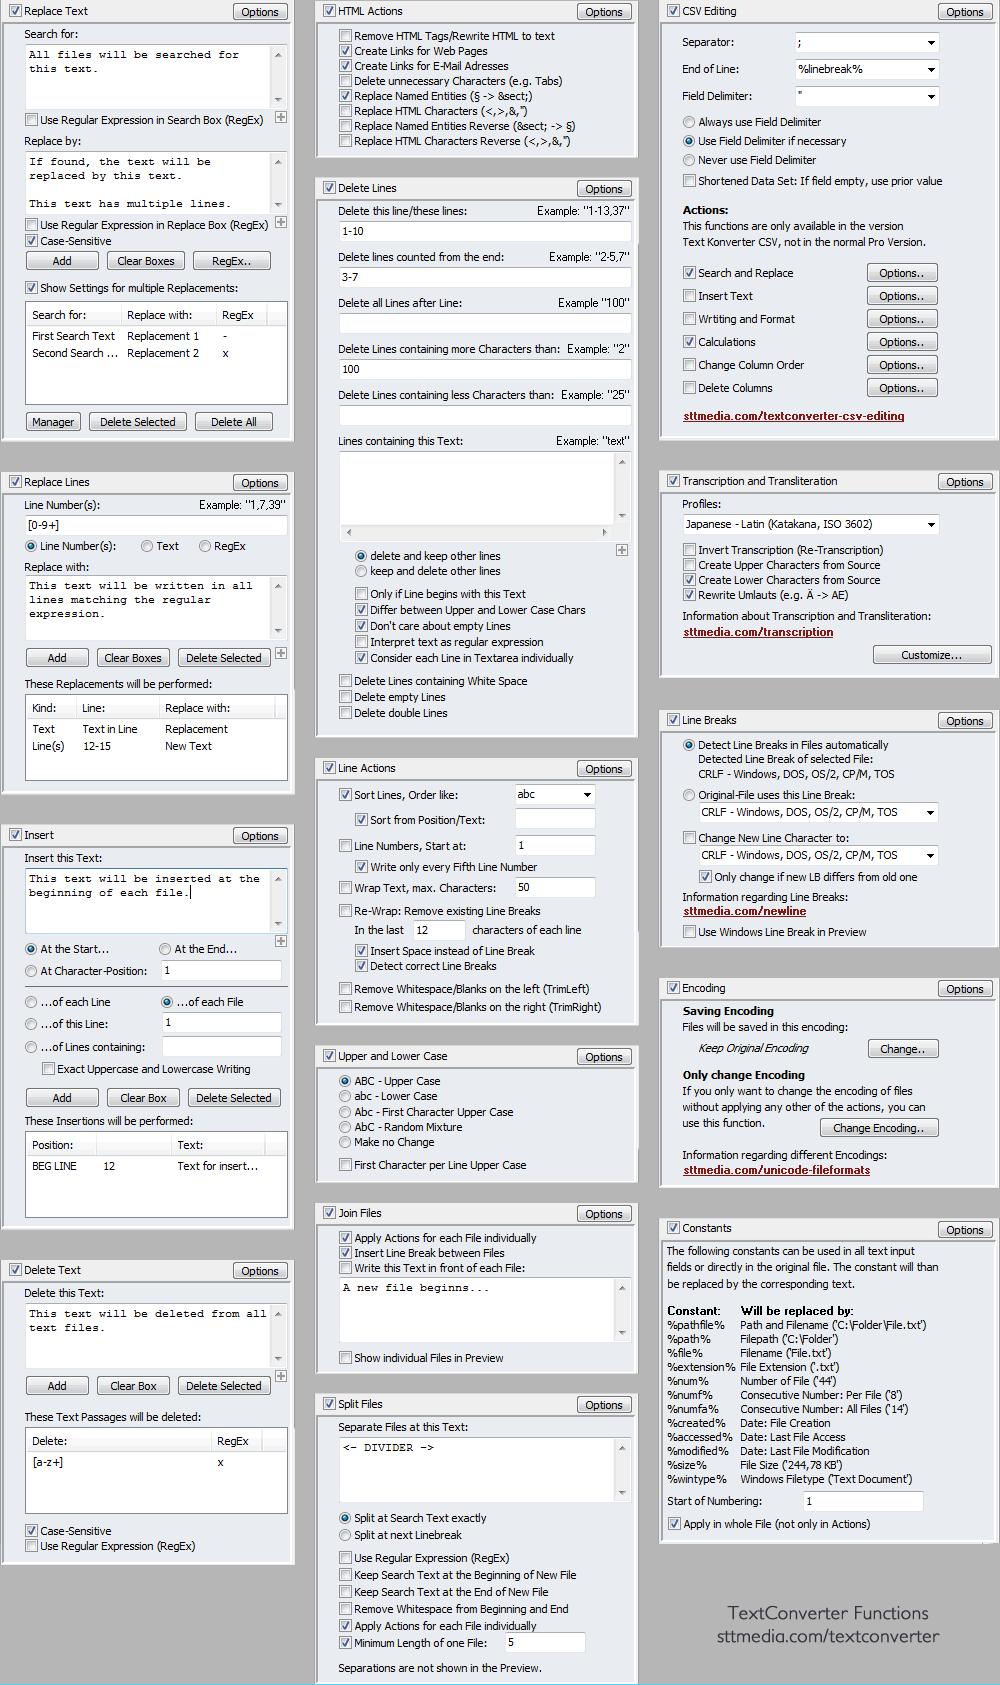 TextConverter - The Actions - Screenshot